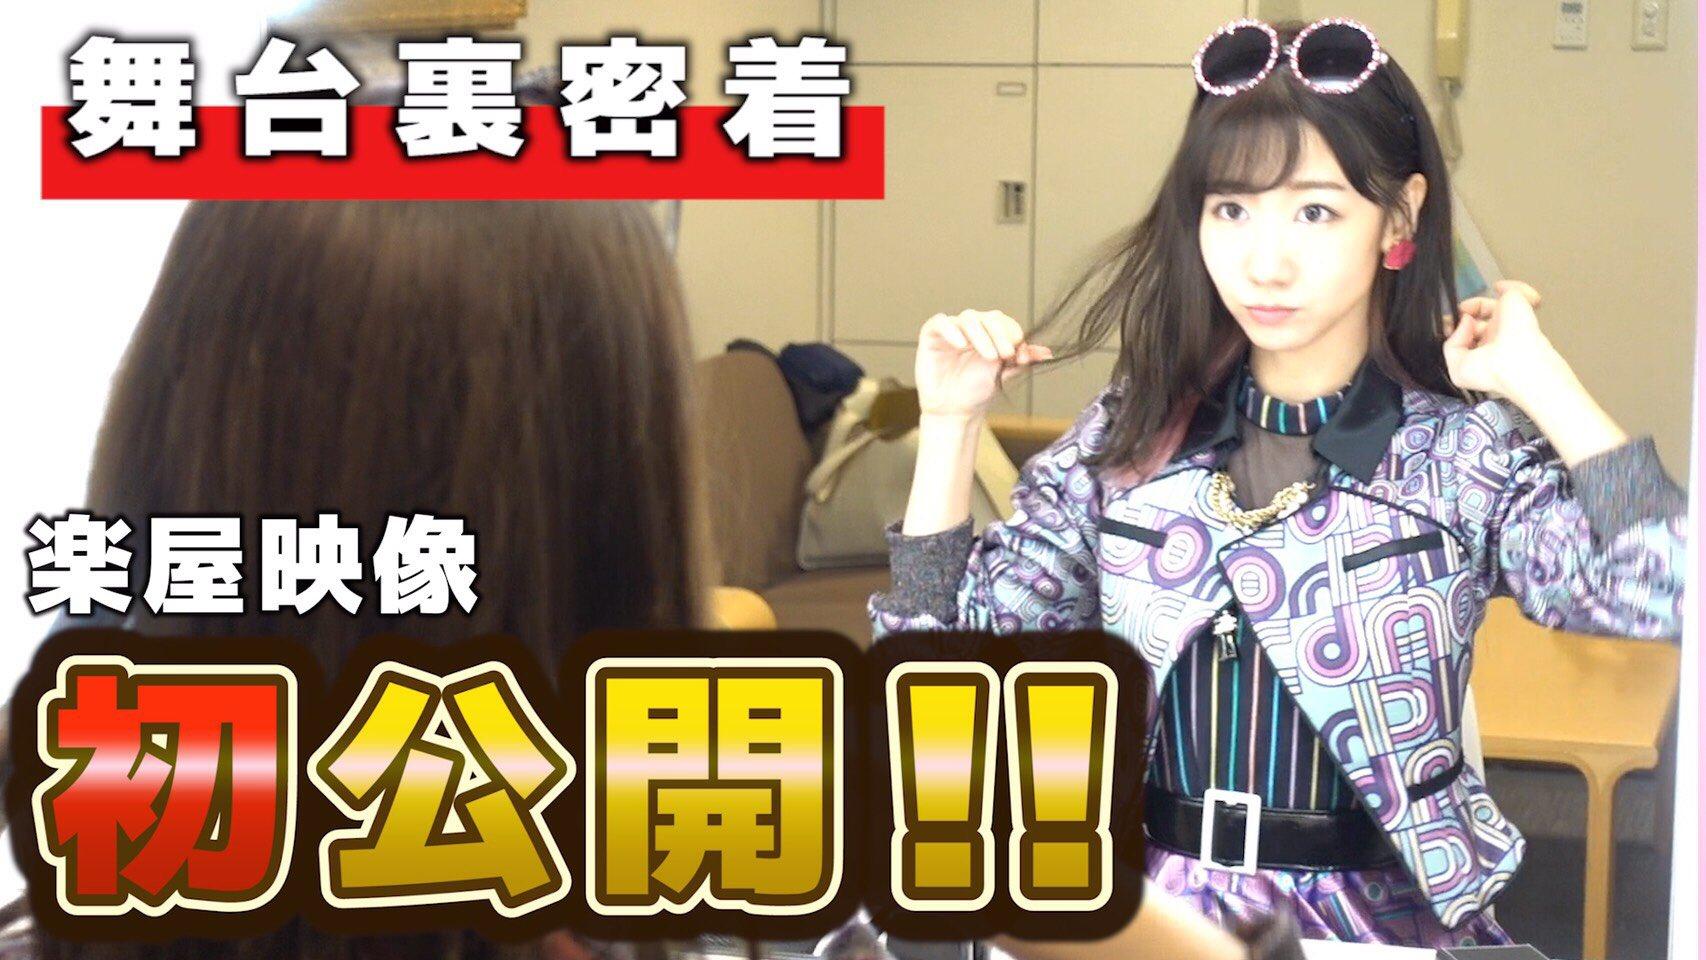 【AKB48】柏木由紀、新作動画公開!リクアワ舞台裏と楽屋でメンバー多数出演